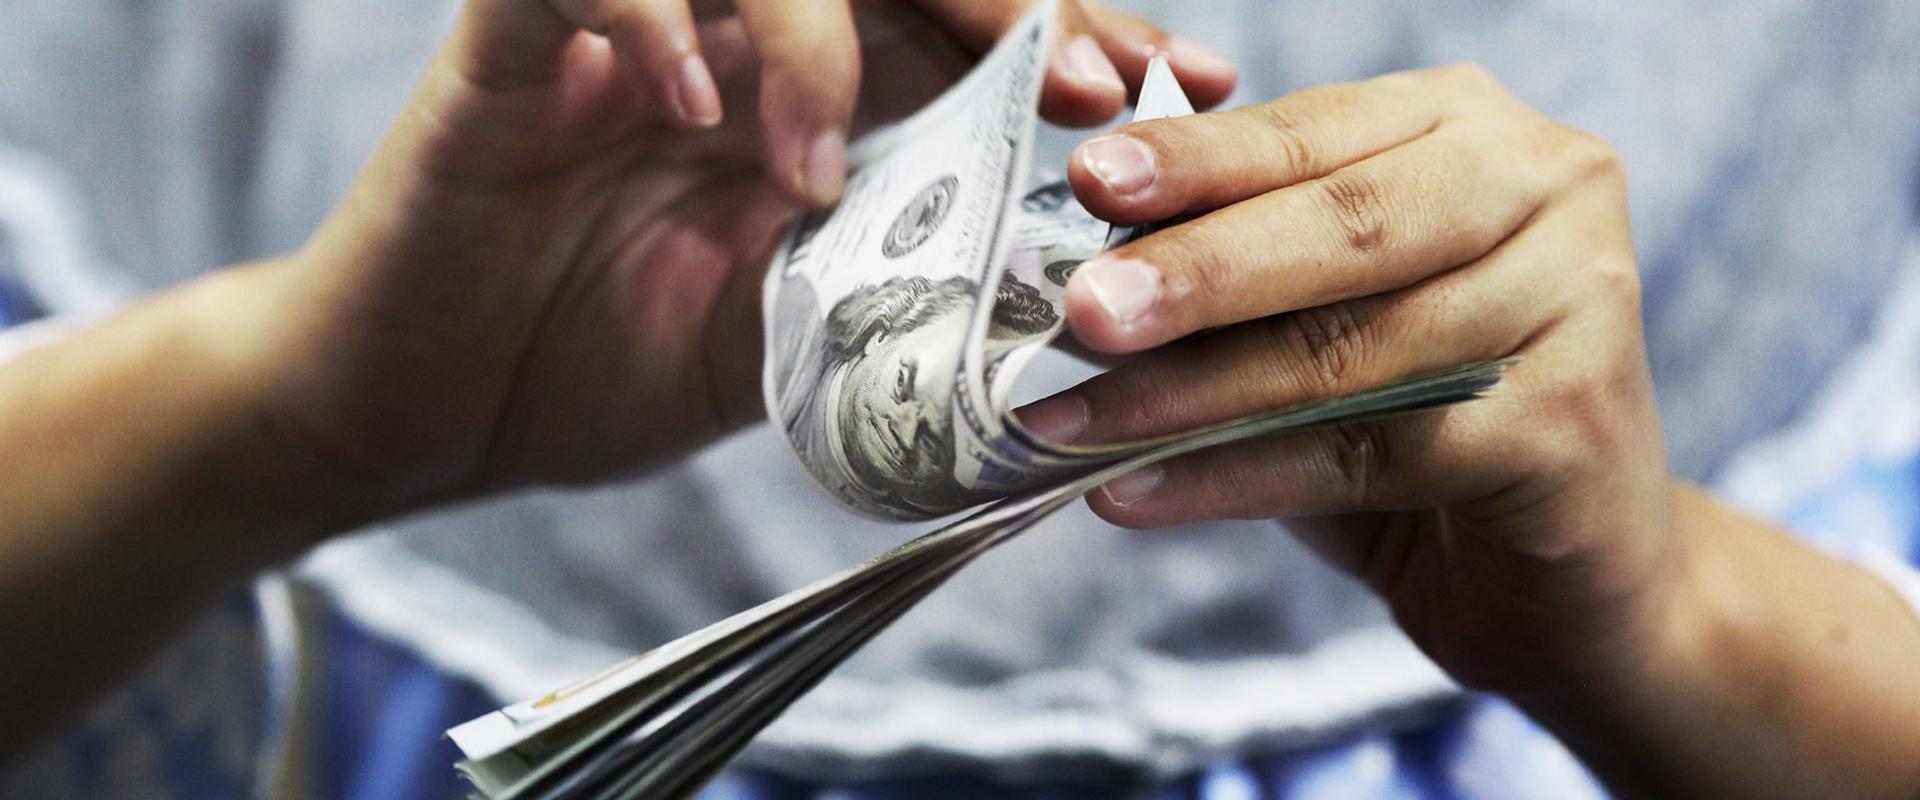 риски инвестиции в облигации сша